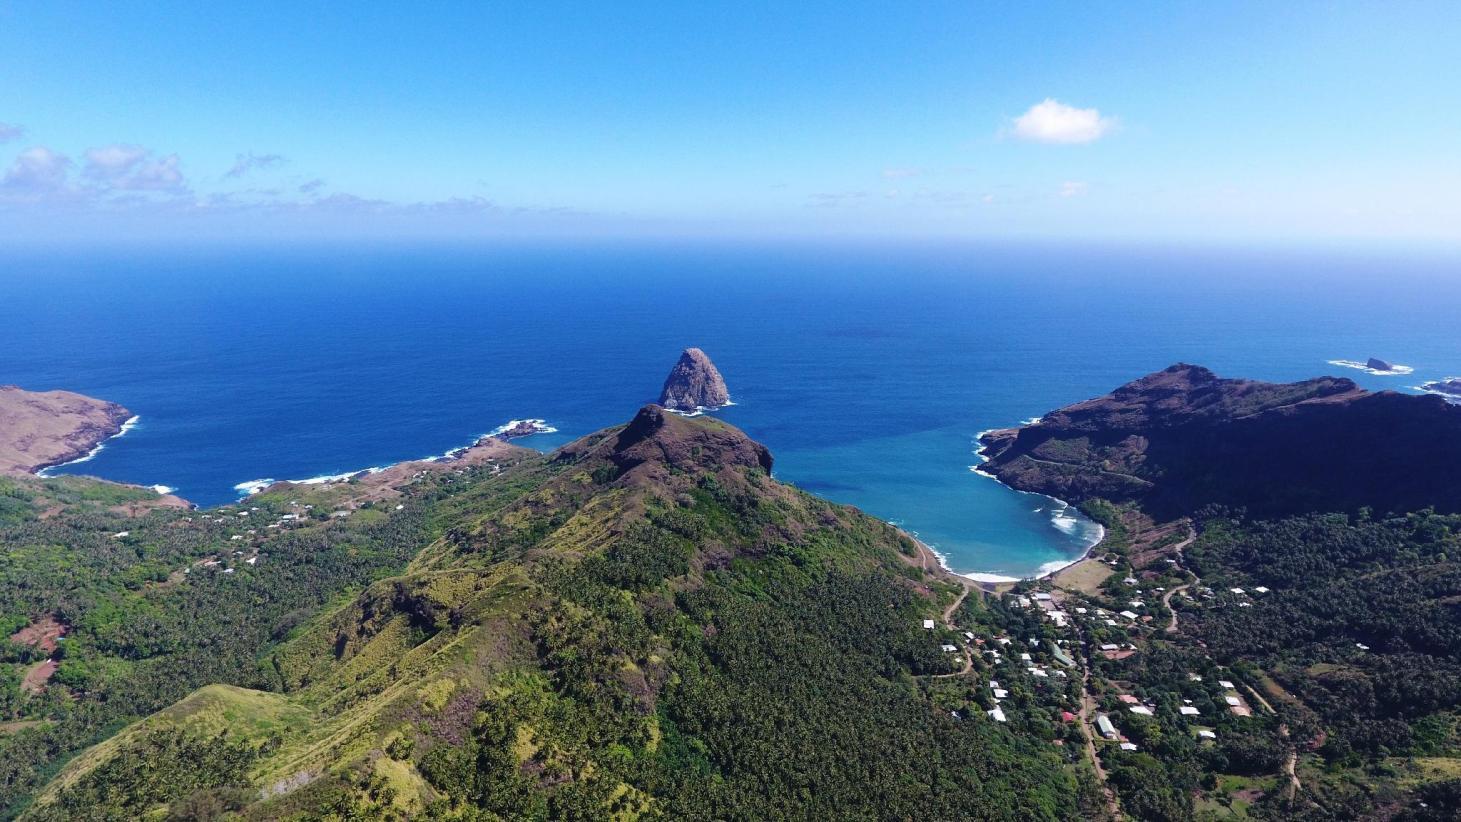 Ilhas Marquesas, da Polinésia Francesa.